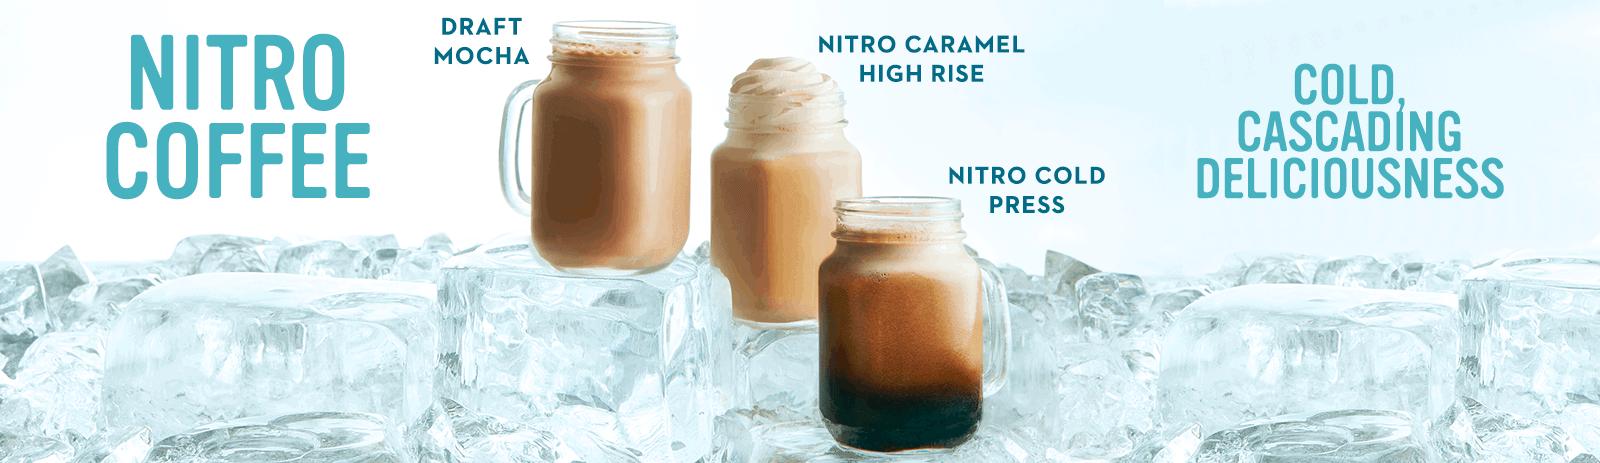 NItro Coffee - Draft mocha, nitro caramel high rise & nitro cold press